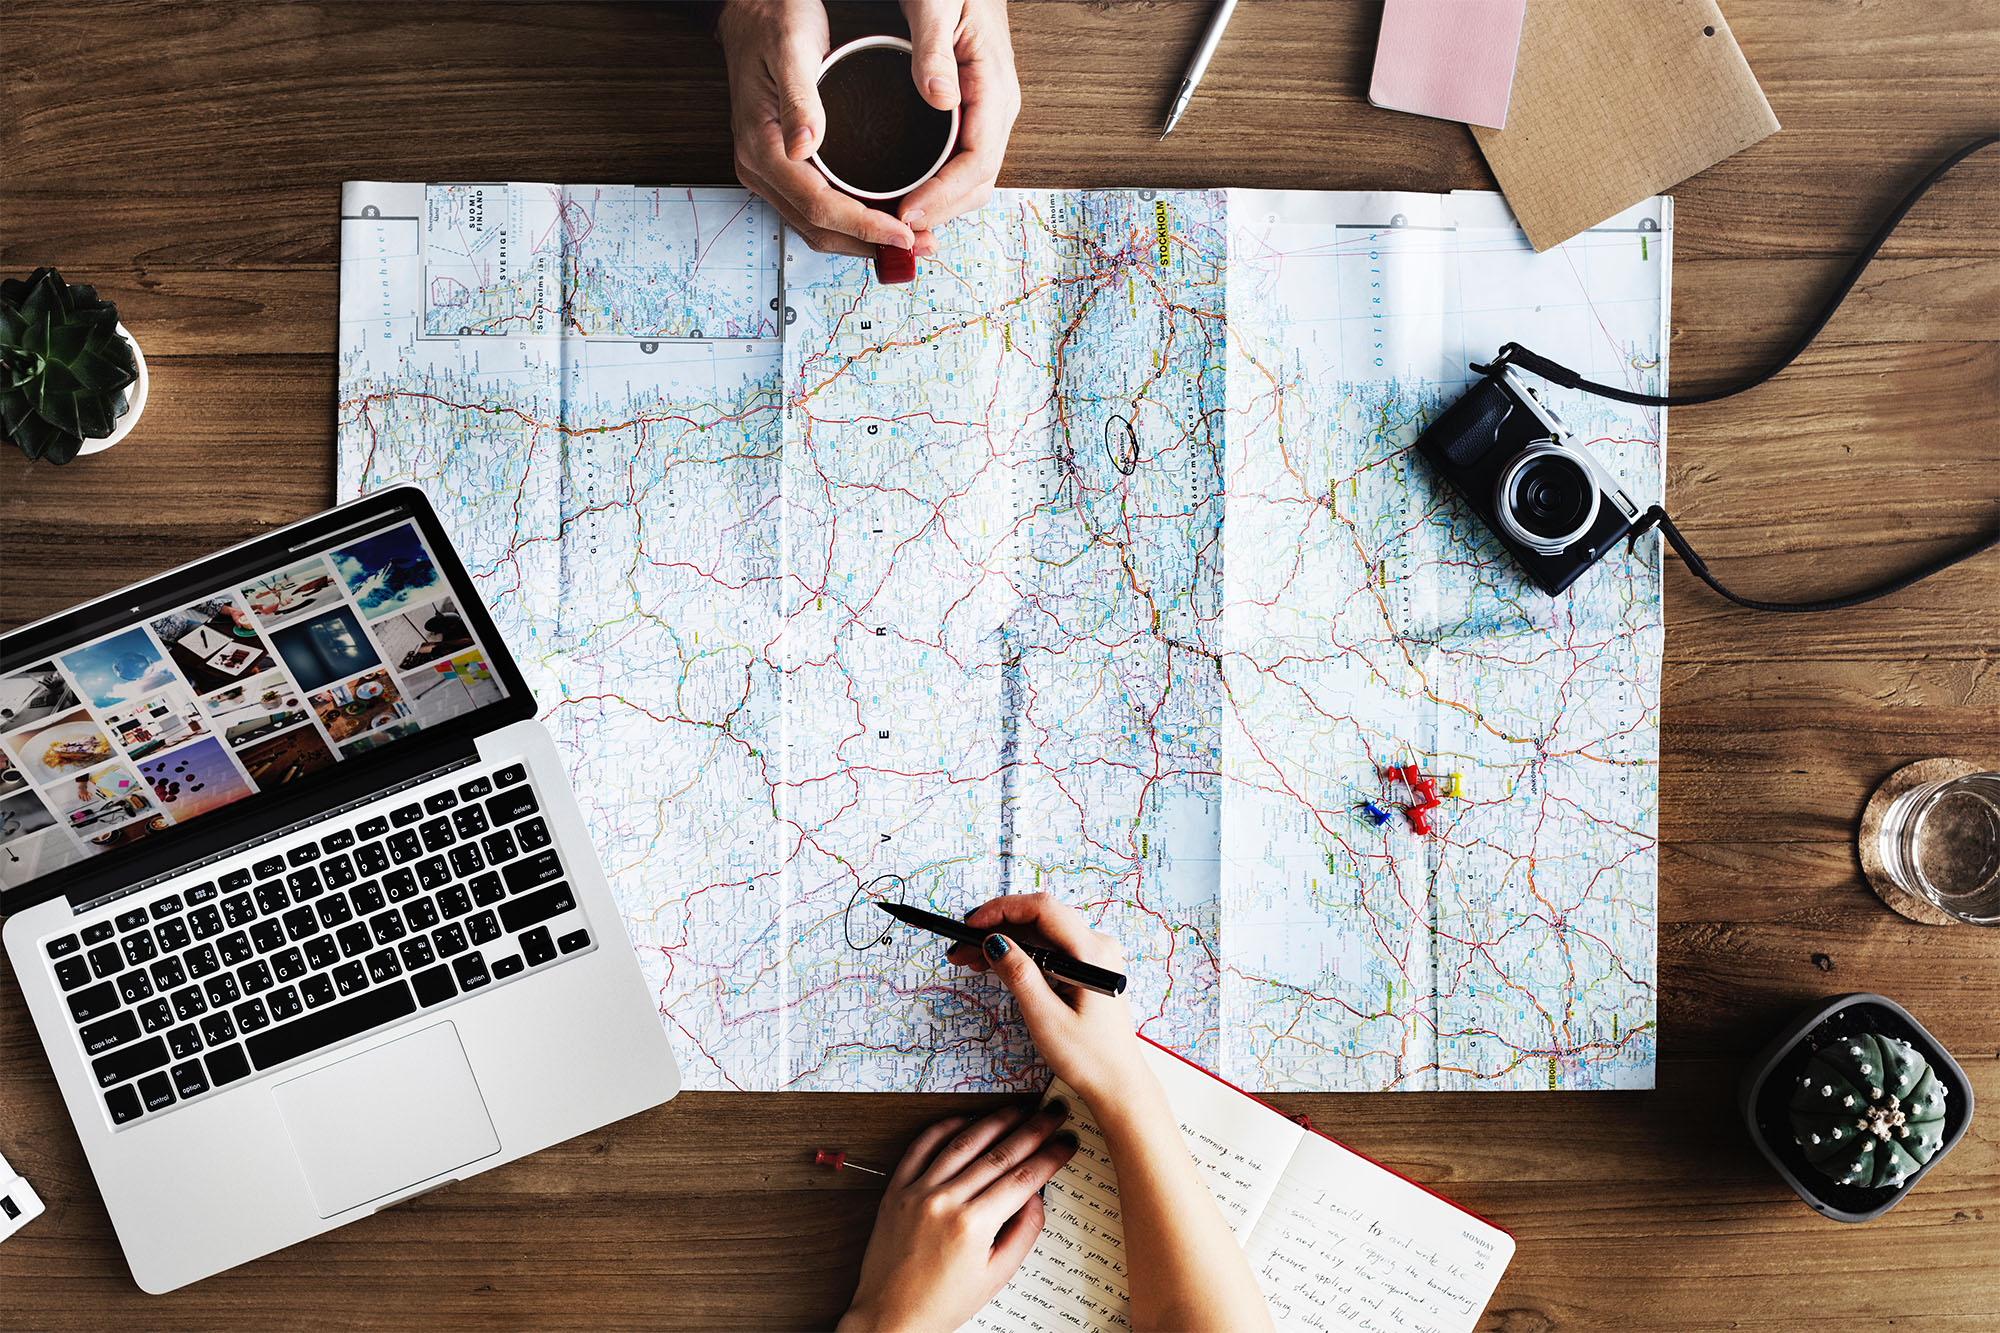 Navigation über echte GPS-Karten planen